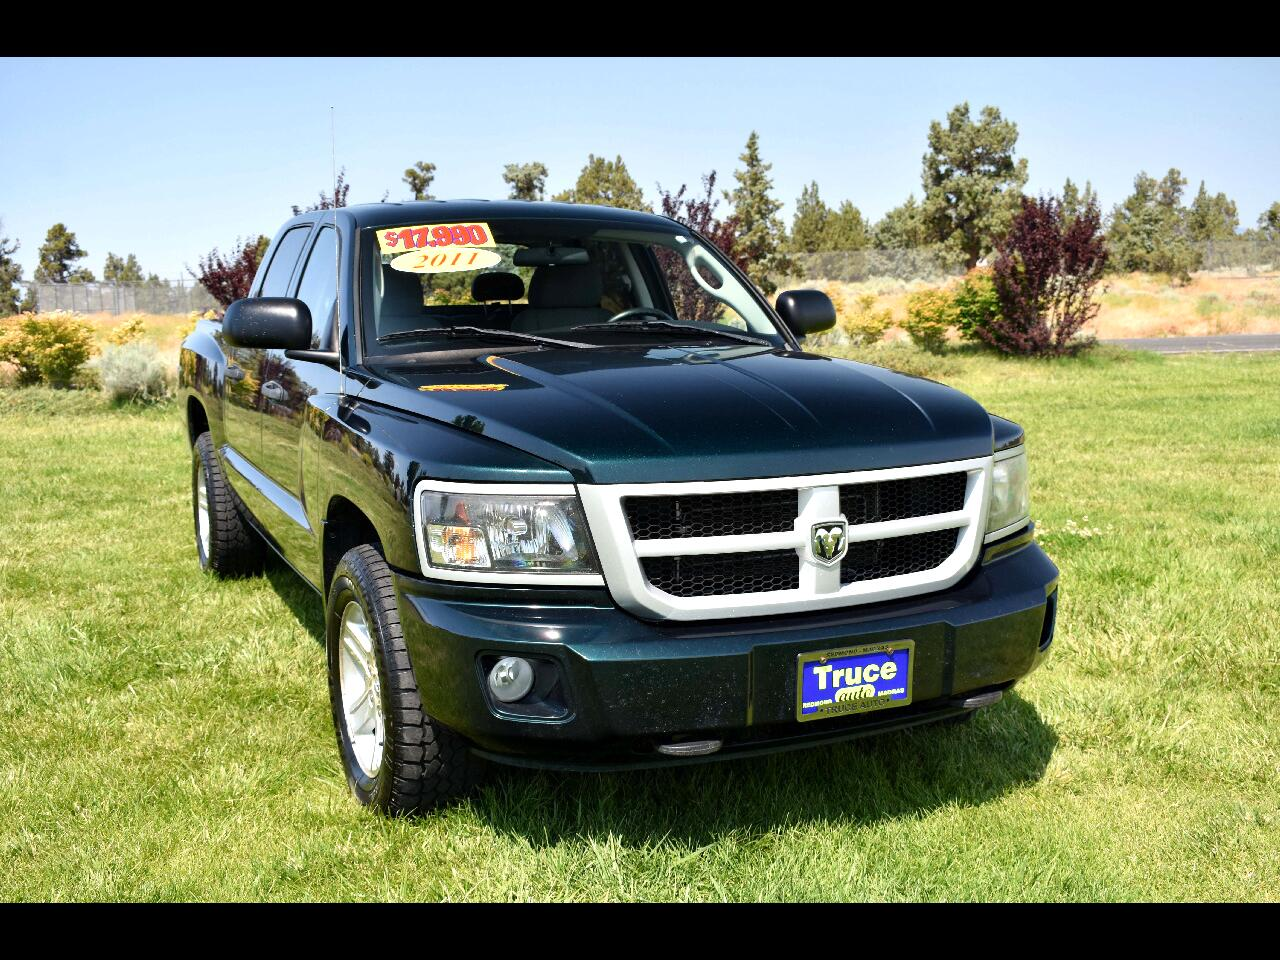 2011 Dodge Dakota 4WD Crew Cab Bighorn/Lonestar